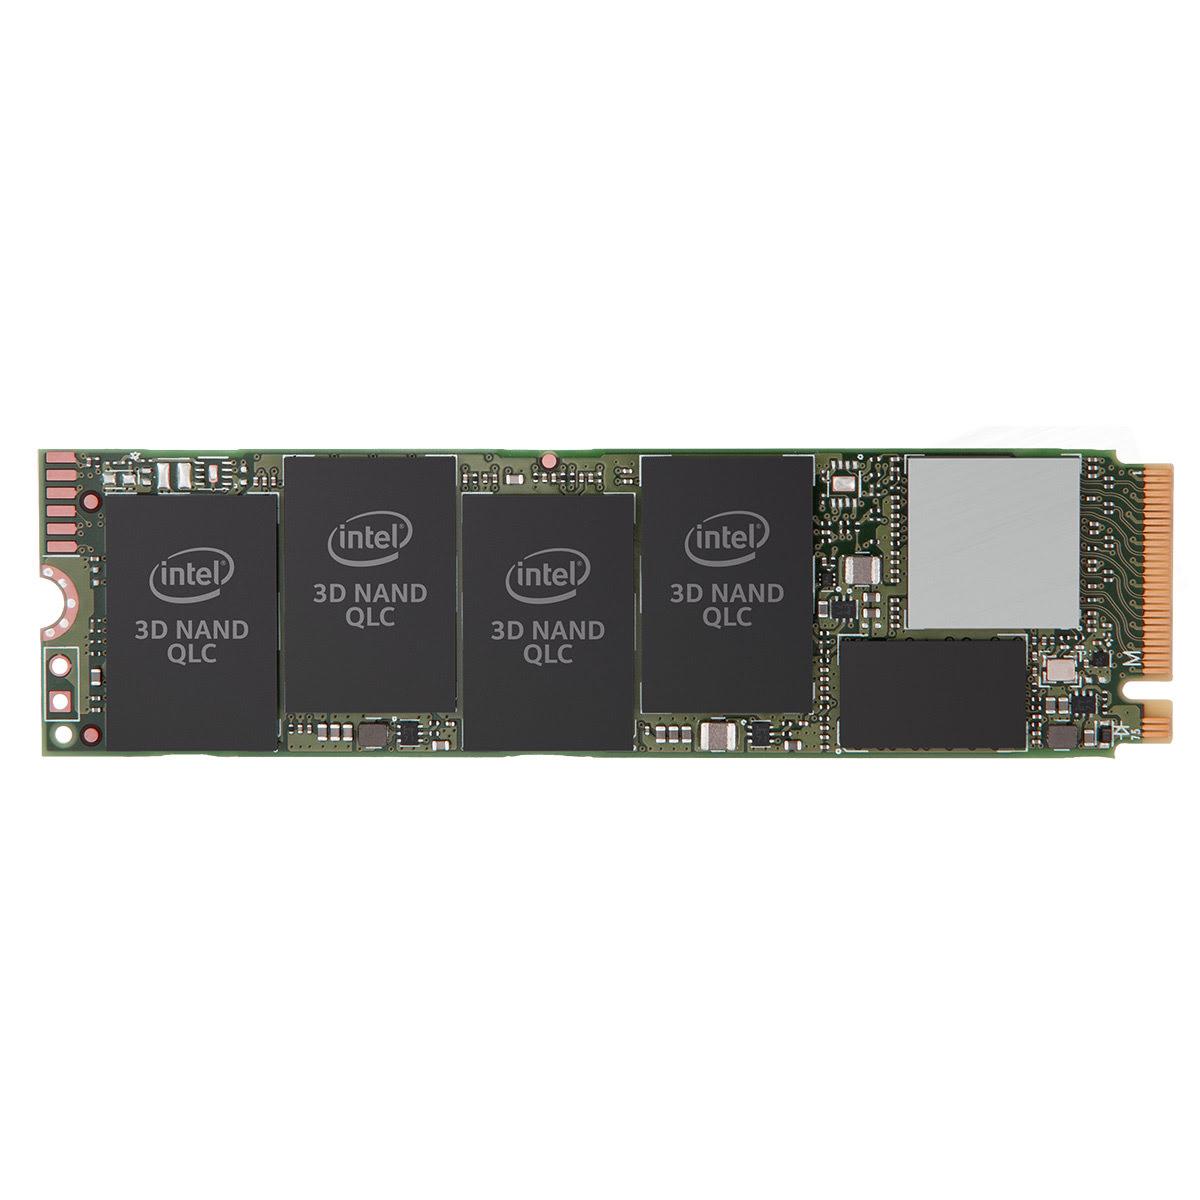 Intel 660P 480-525Go M.2 - Disque SSD Intel - Cybertek.fr - 1